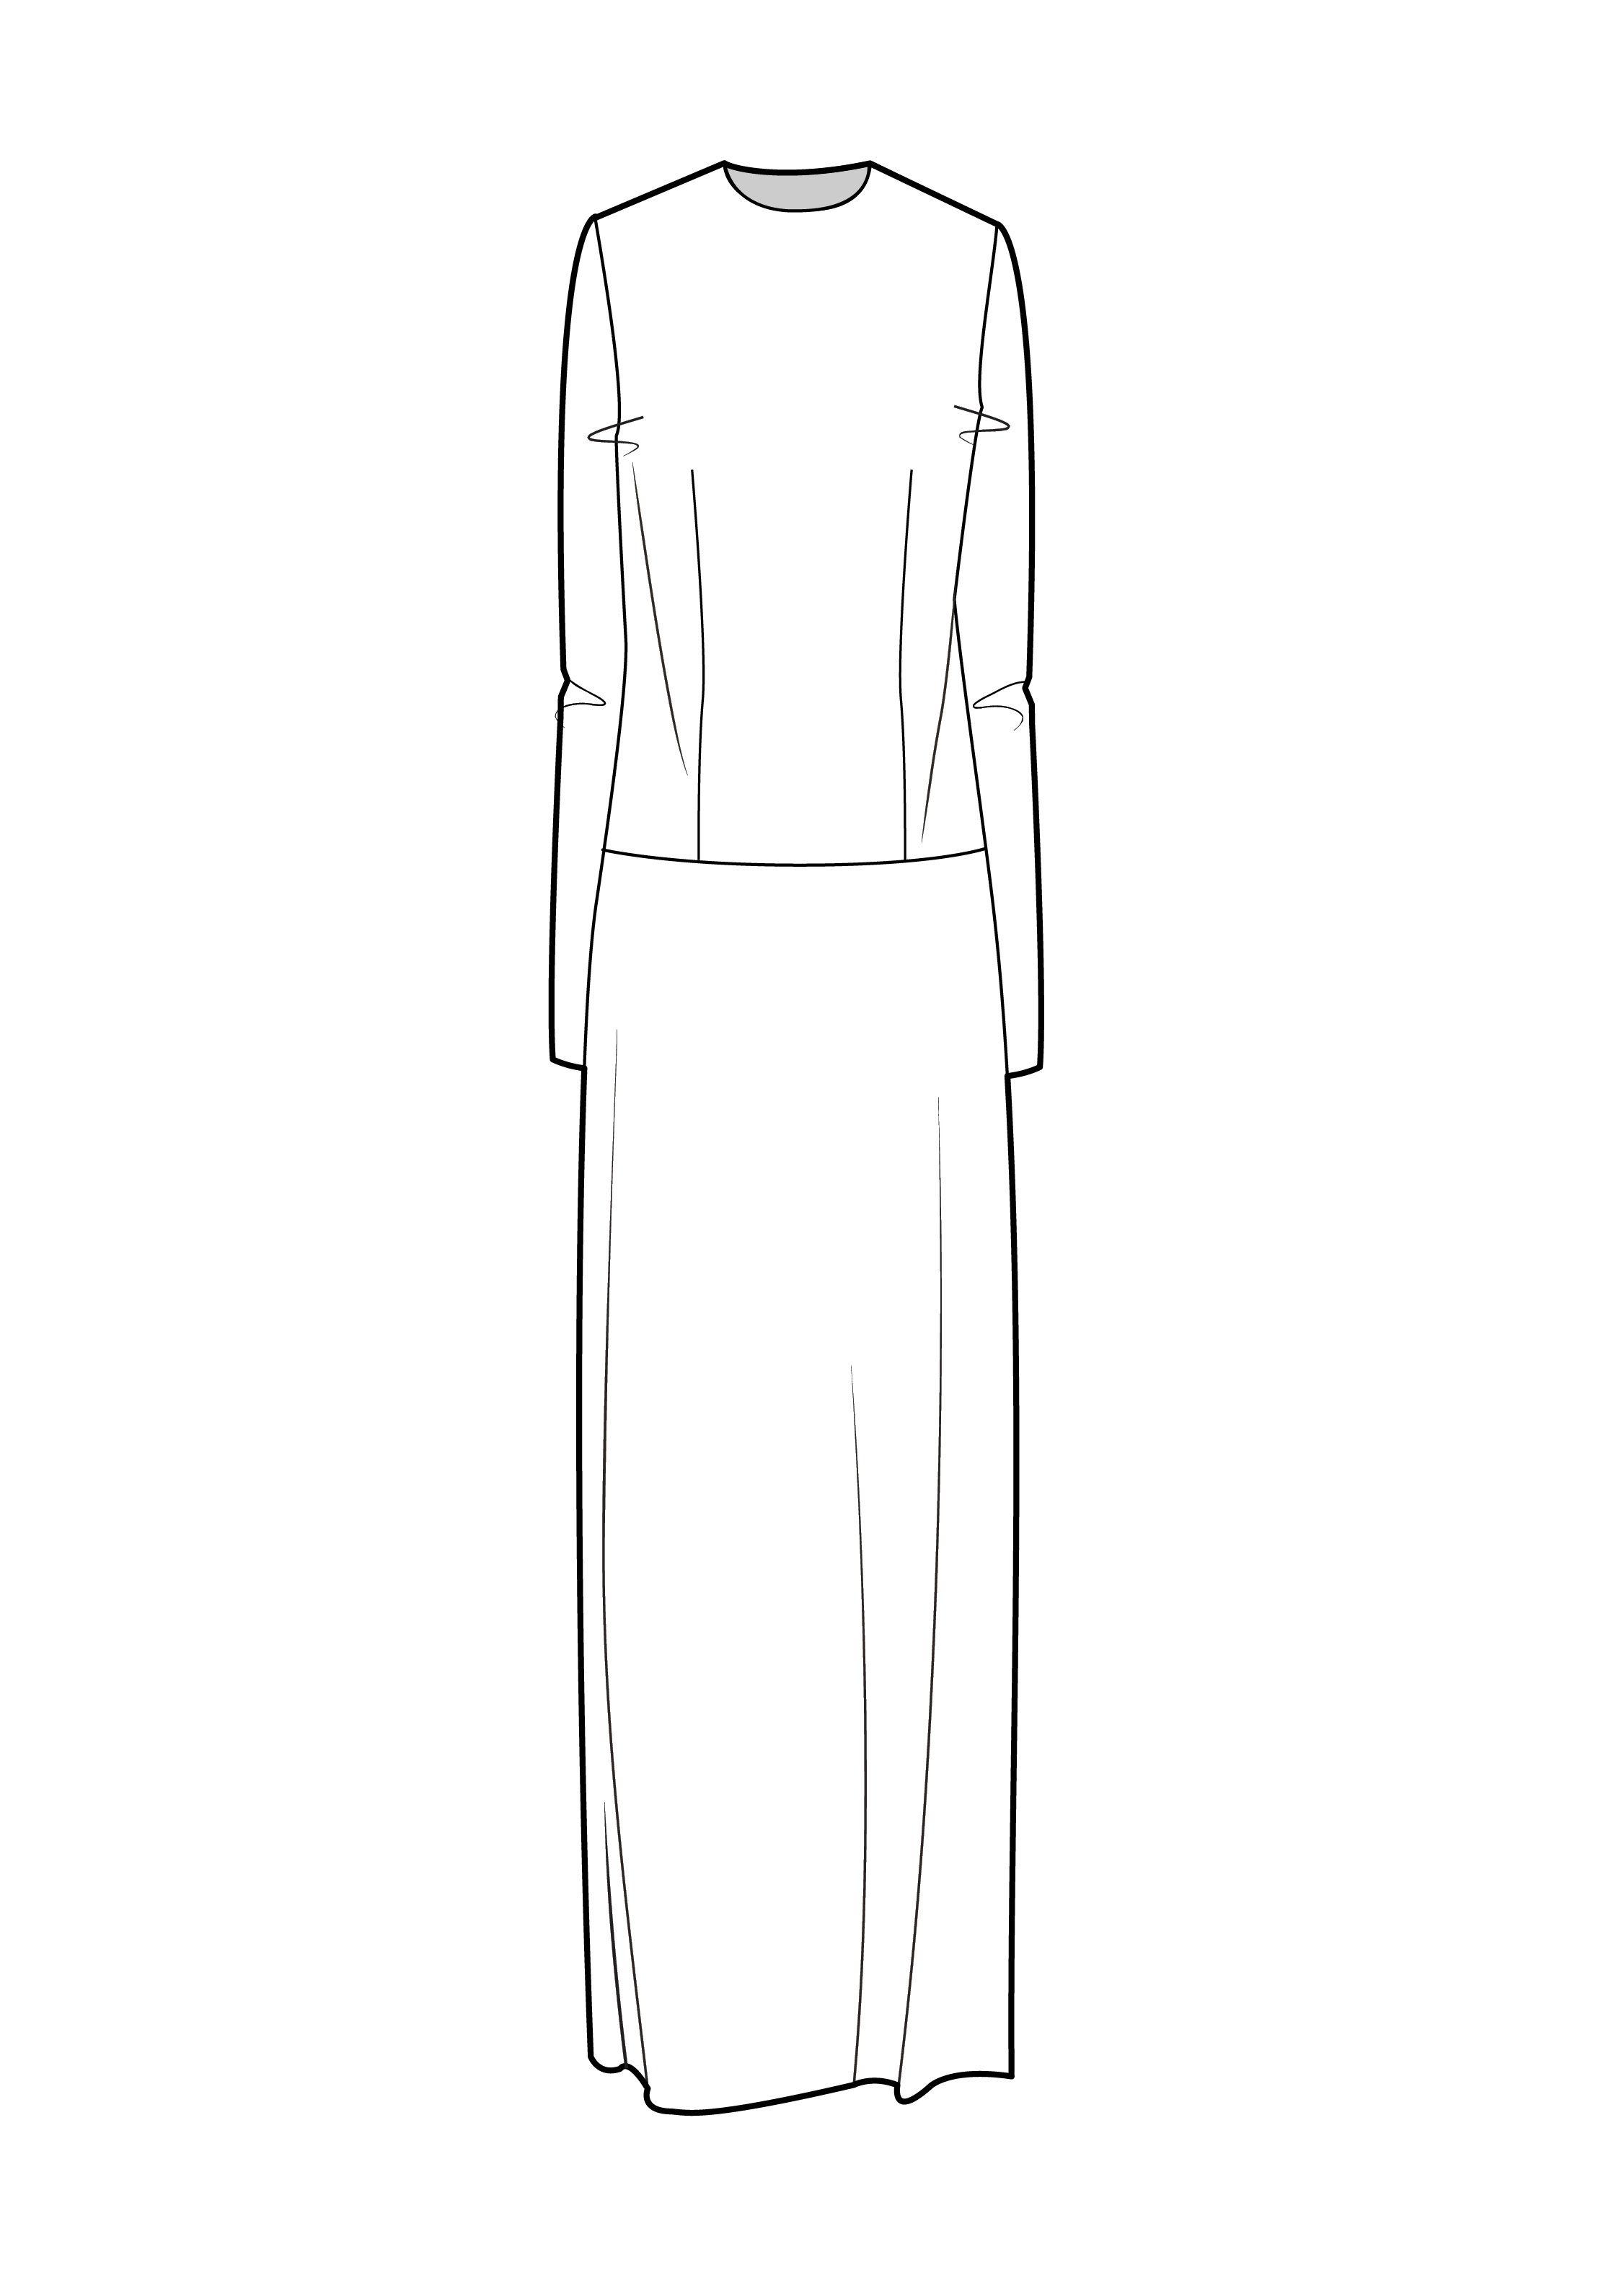 Drawn Coat Sweater 15 389 X 515 Dumielauxepicesnet